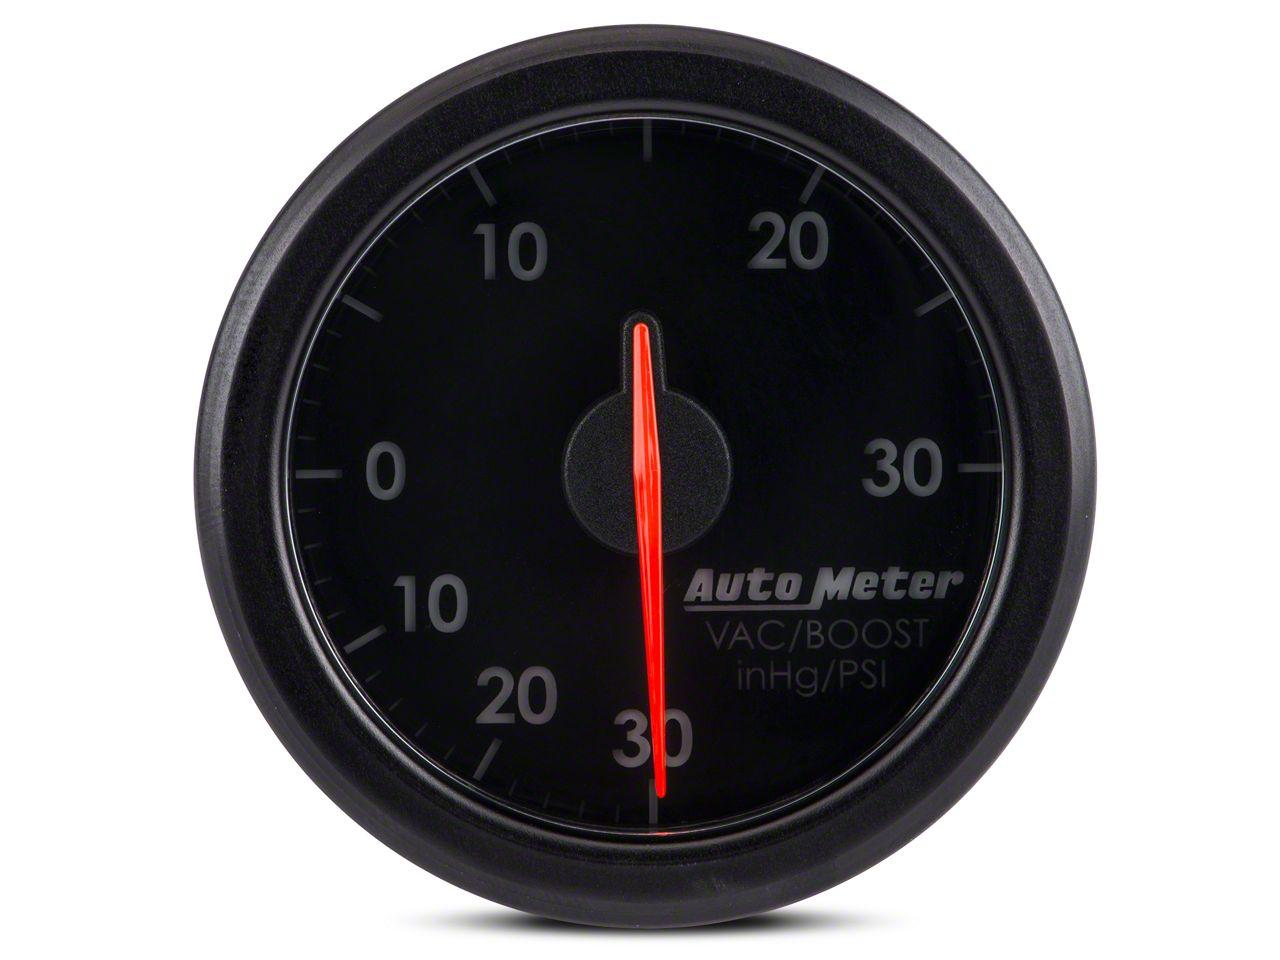 Auto Meter AirDrive Boost/Vac Gauge - Electrical (99-18 Silverado 1500)